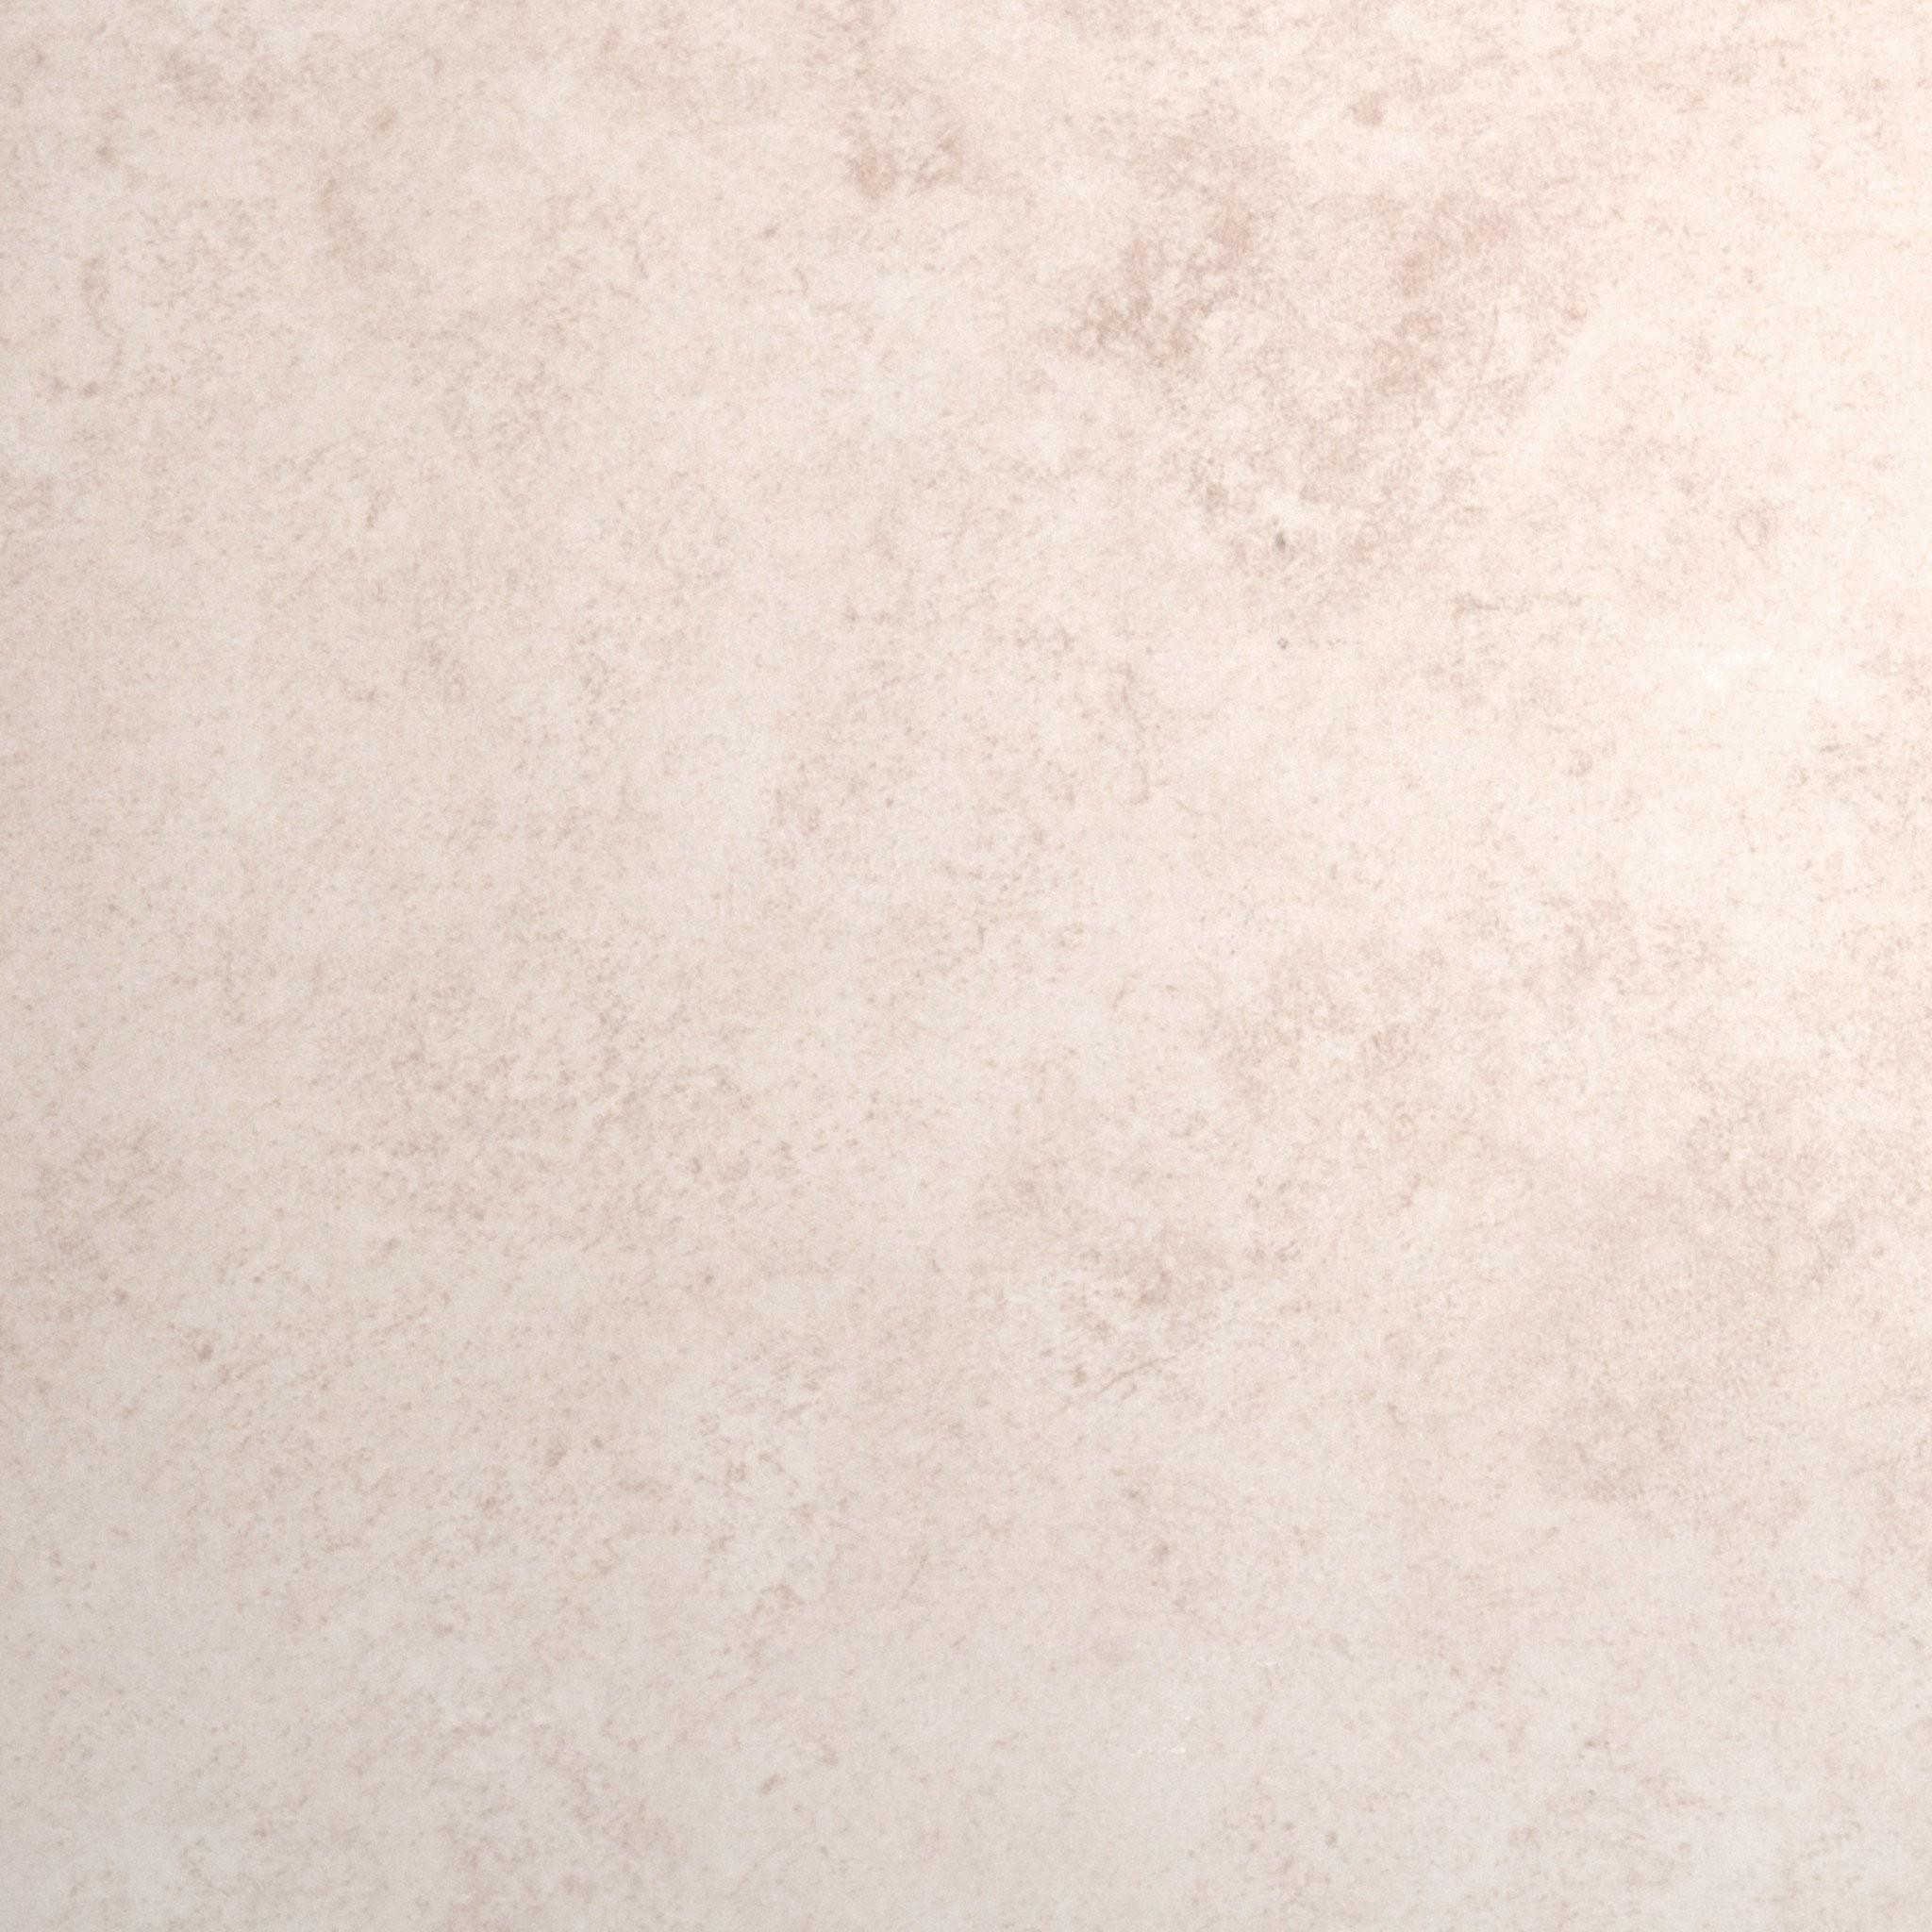 Where To Buy Baja Ceramic Tiles Emser Tile